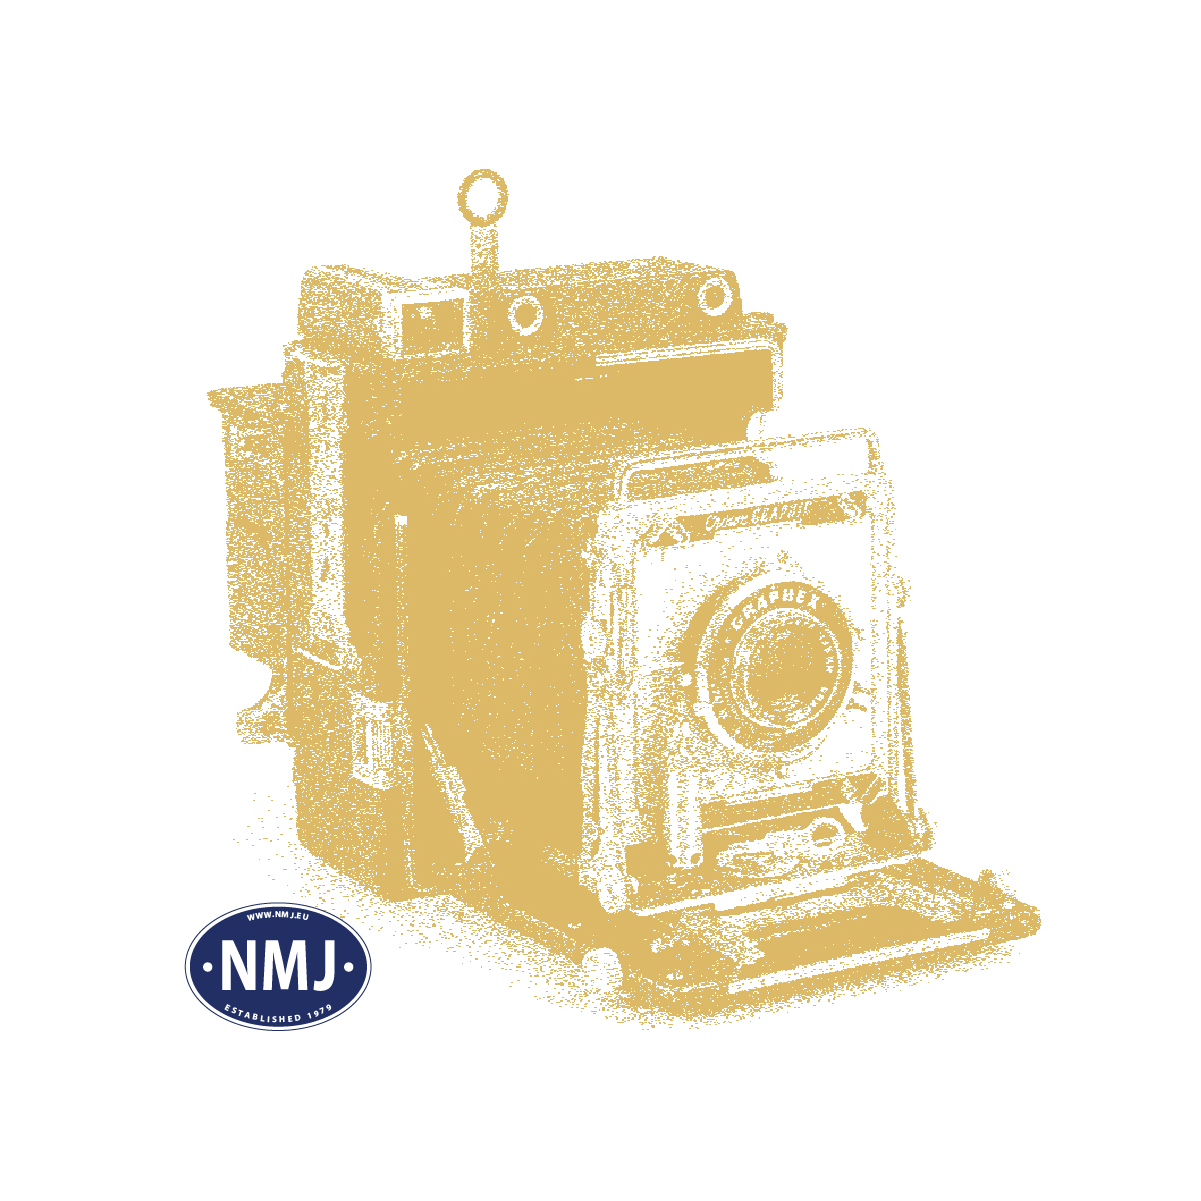 "NMJT605.304 - NMJ Topline Grf 48018 ""Tre Ess/Milda"" refrigerator car"